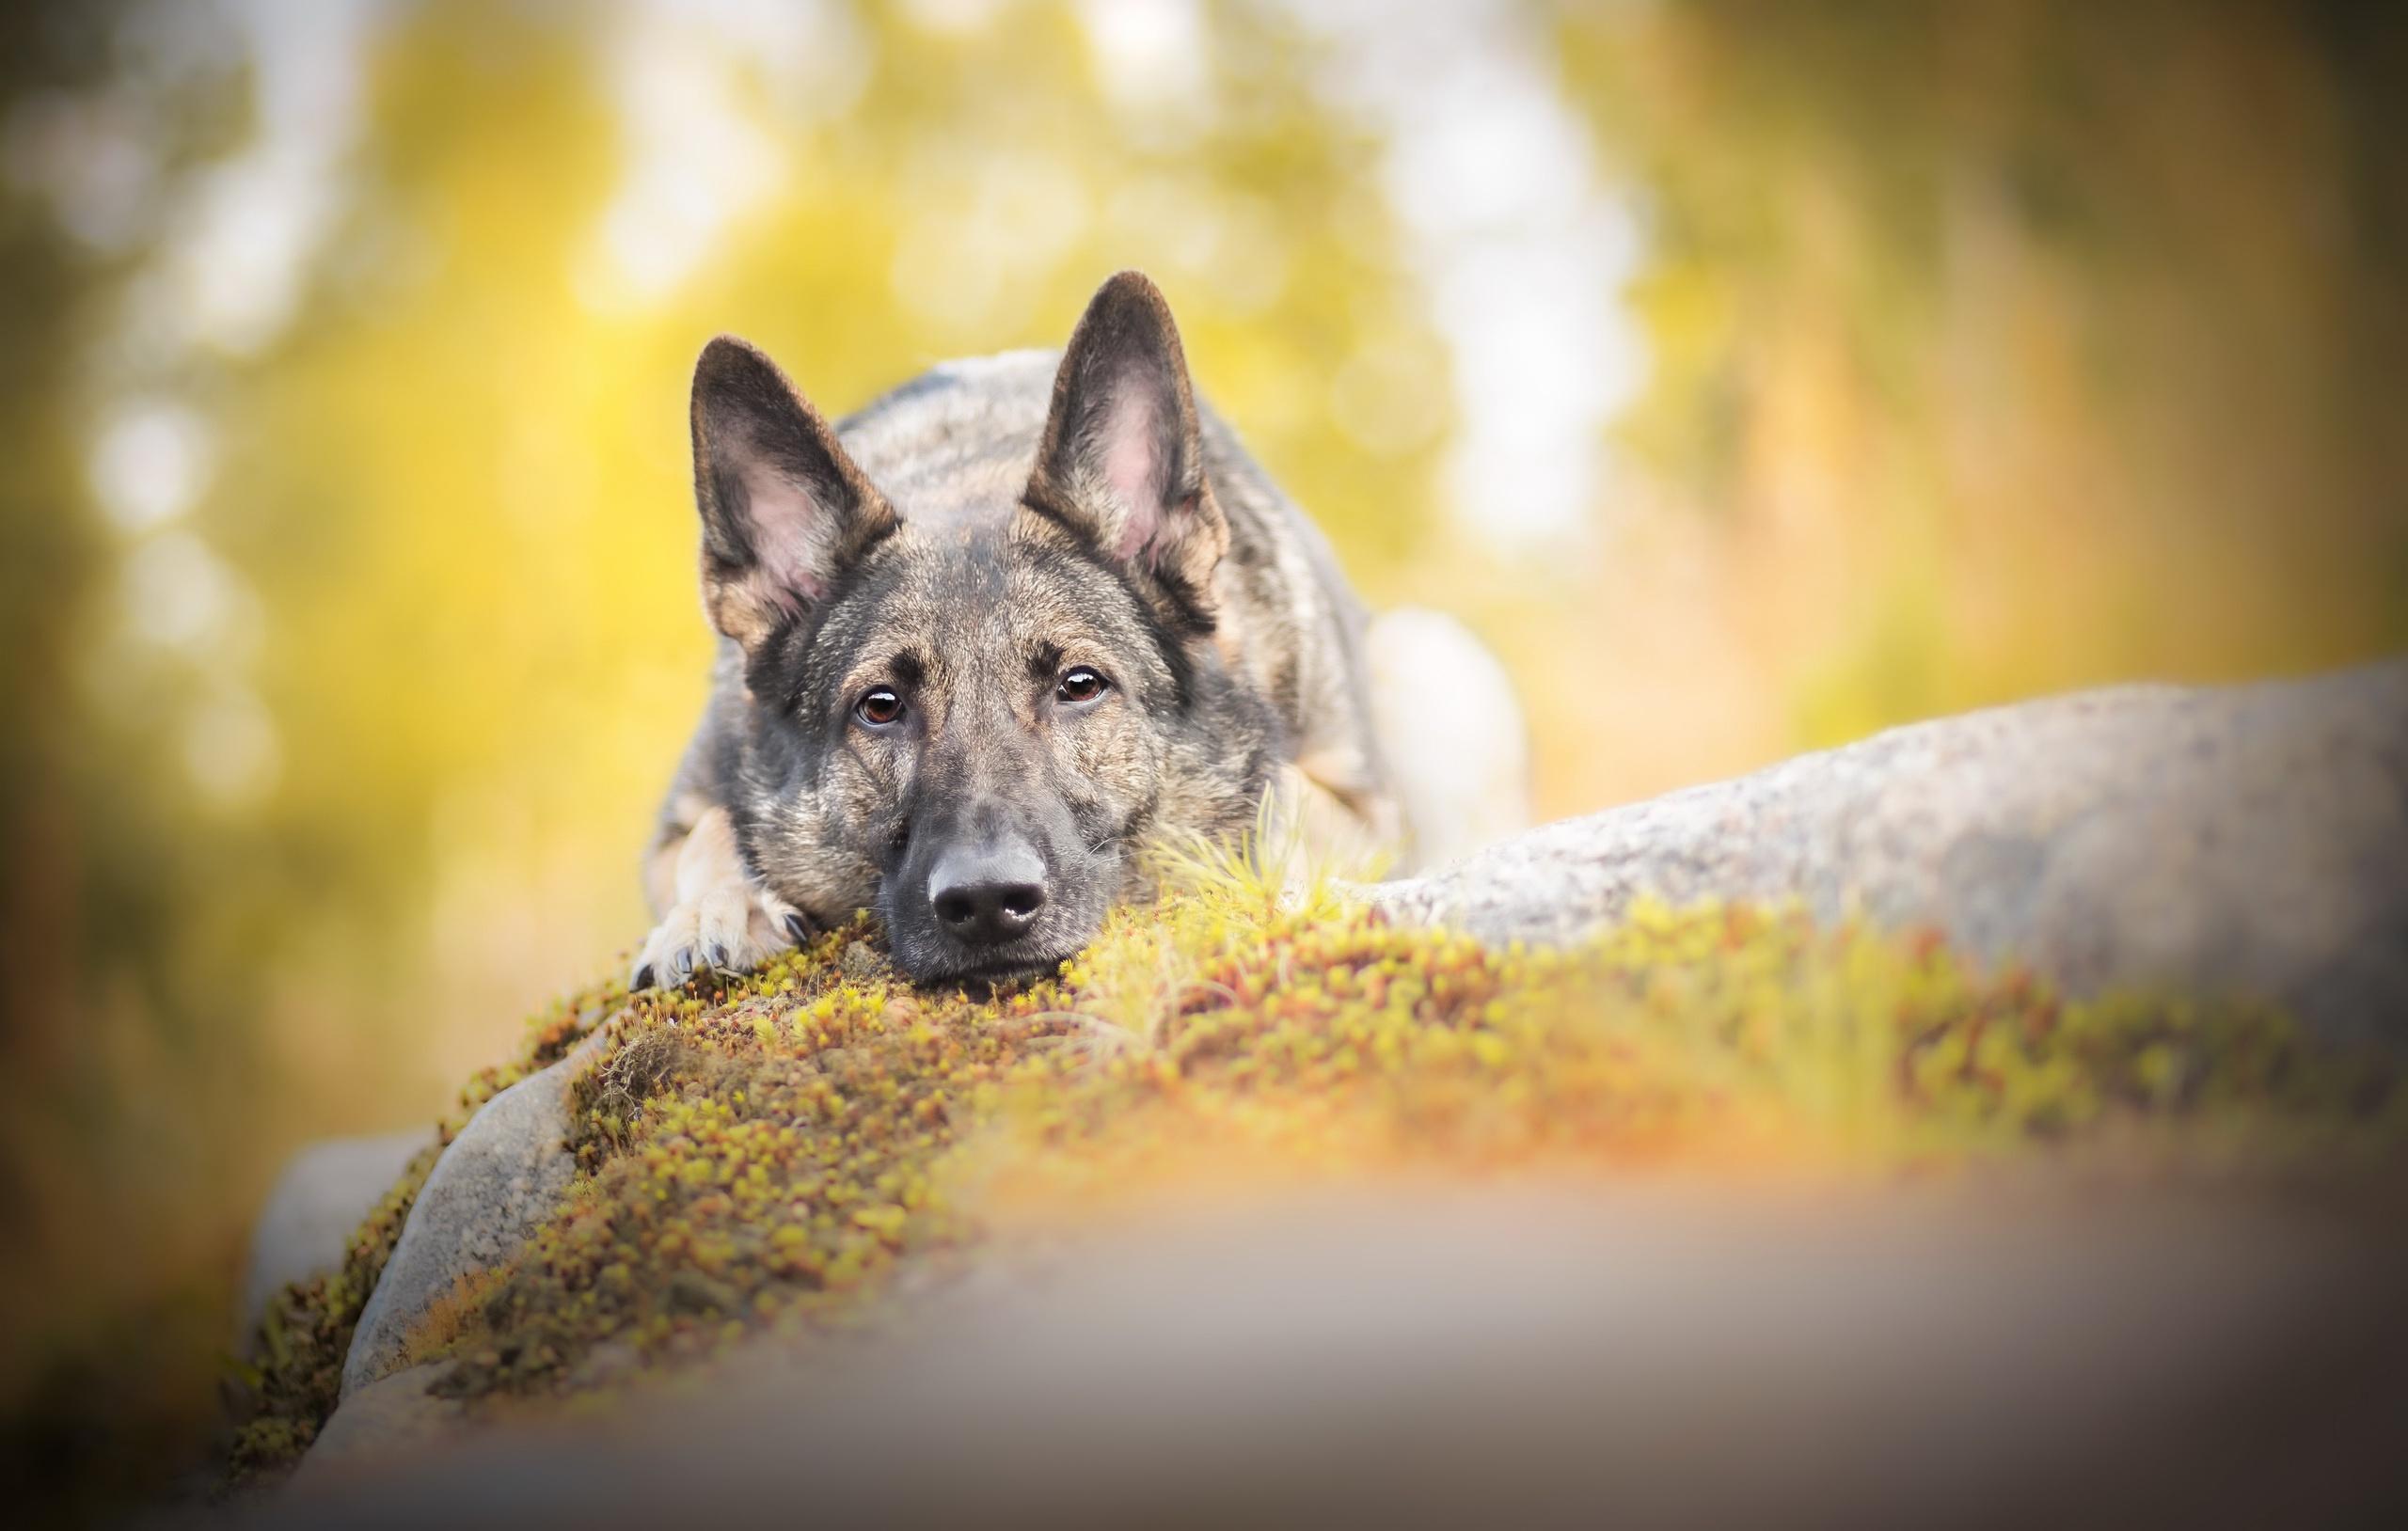 Dog Pet Muzzle Stare Depth Of Field Resting 2560x1628